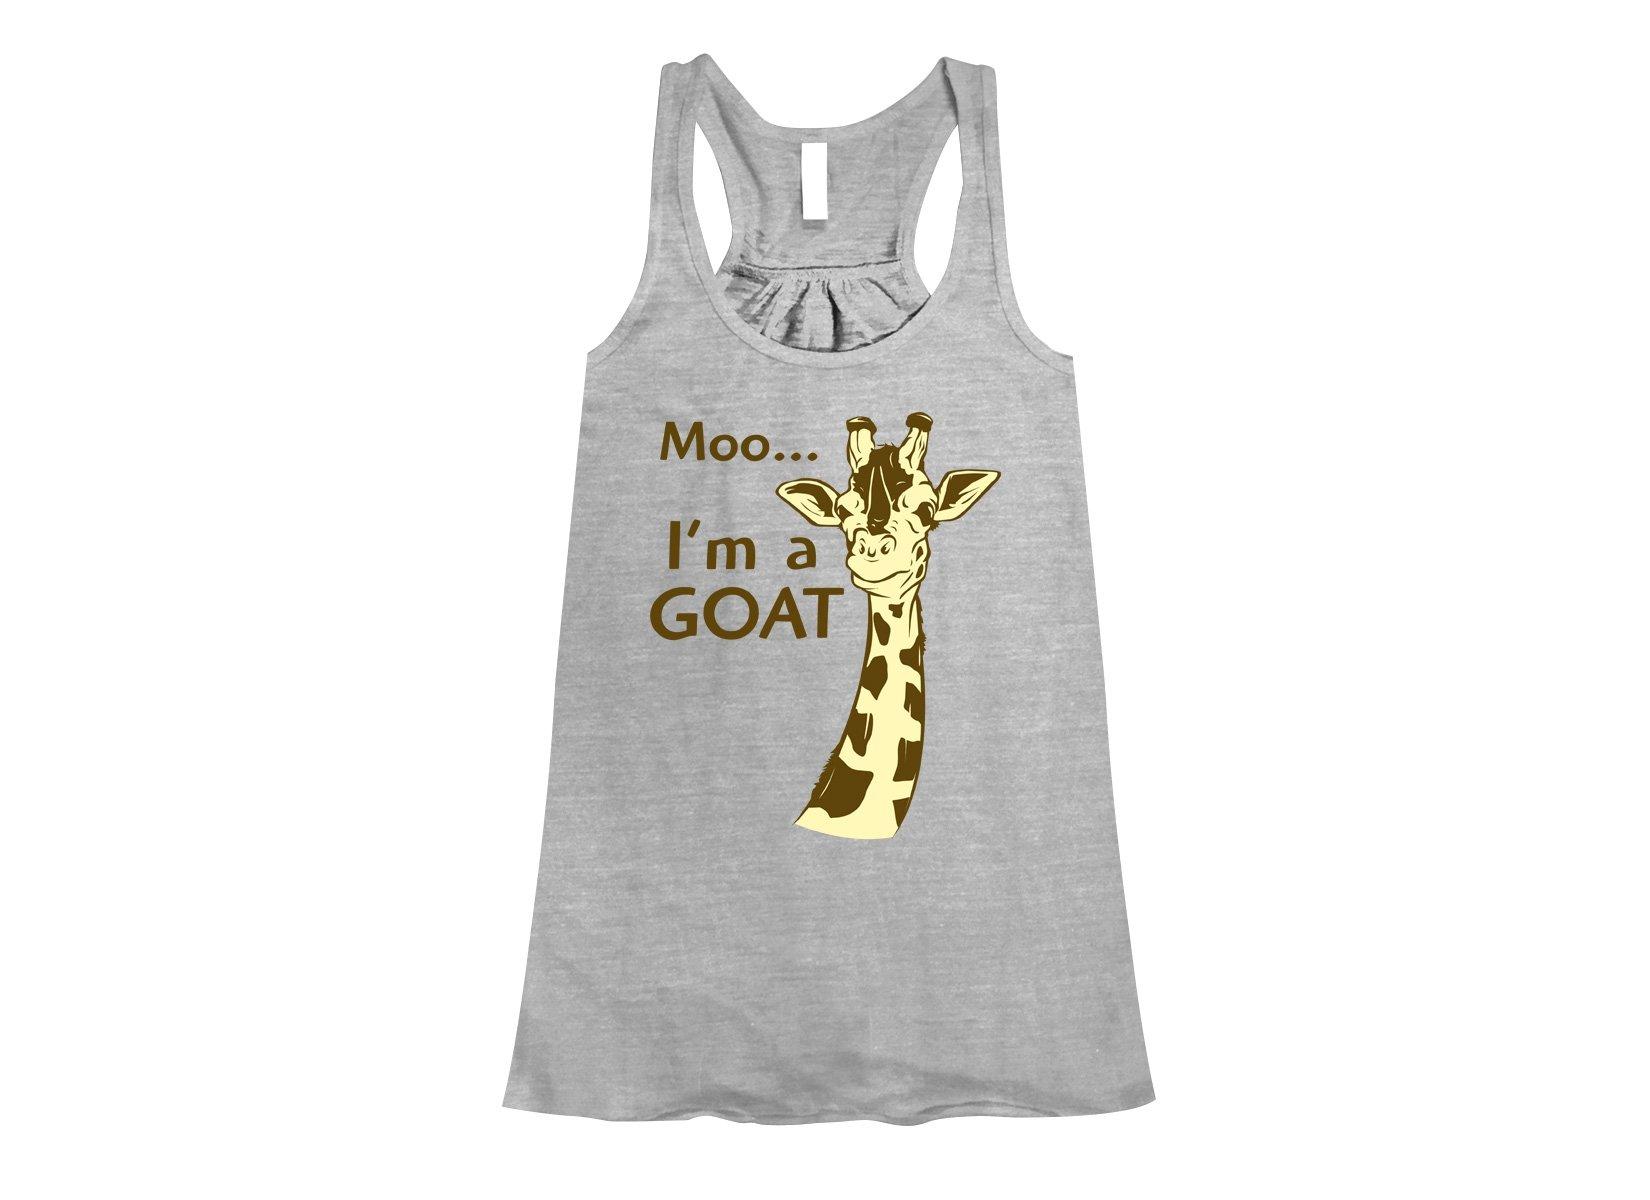 Moo, I'm A Goat on Womens Tanks T-Shirt